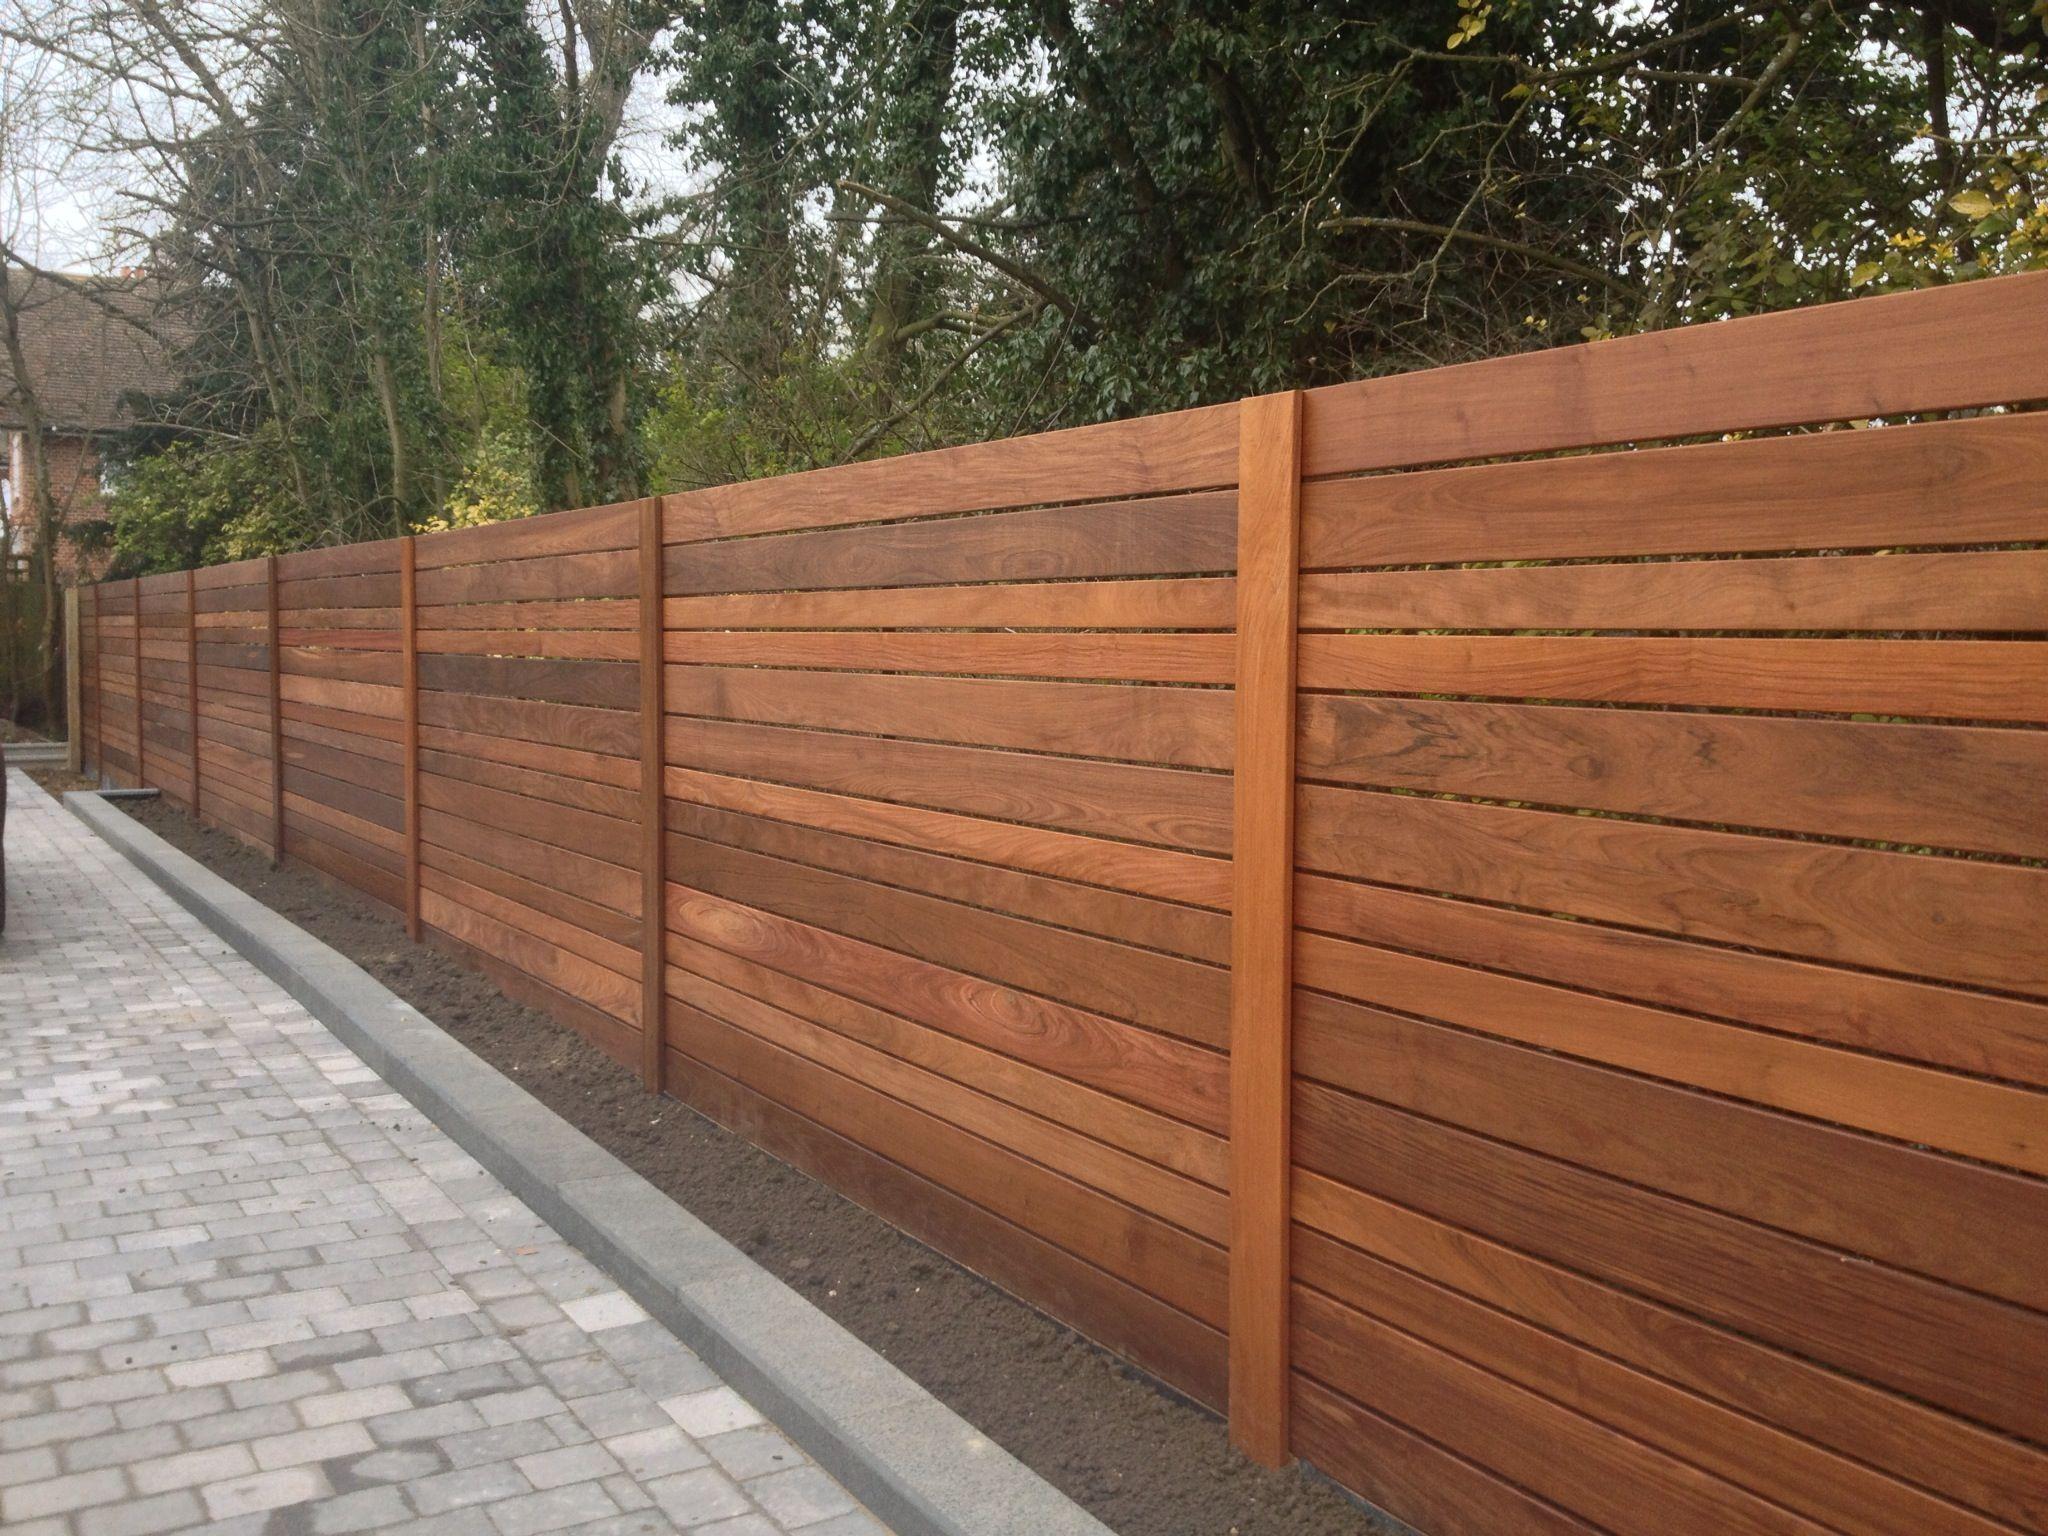 Ipe hardwood fence design | Fences in 2018 | Pinterest ...